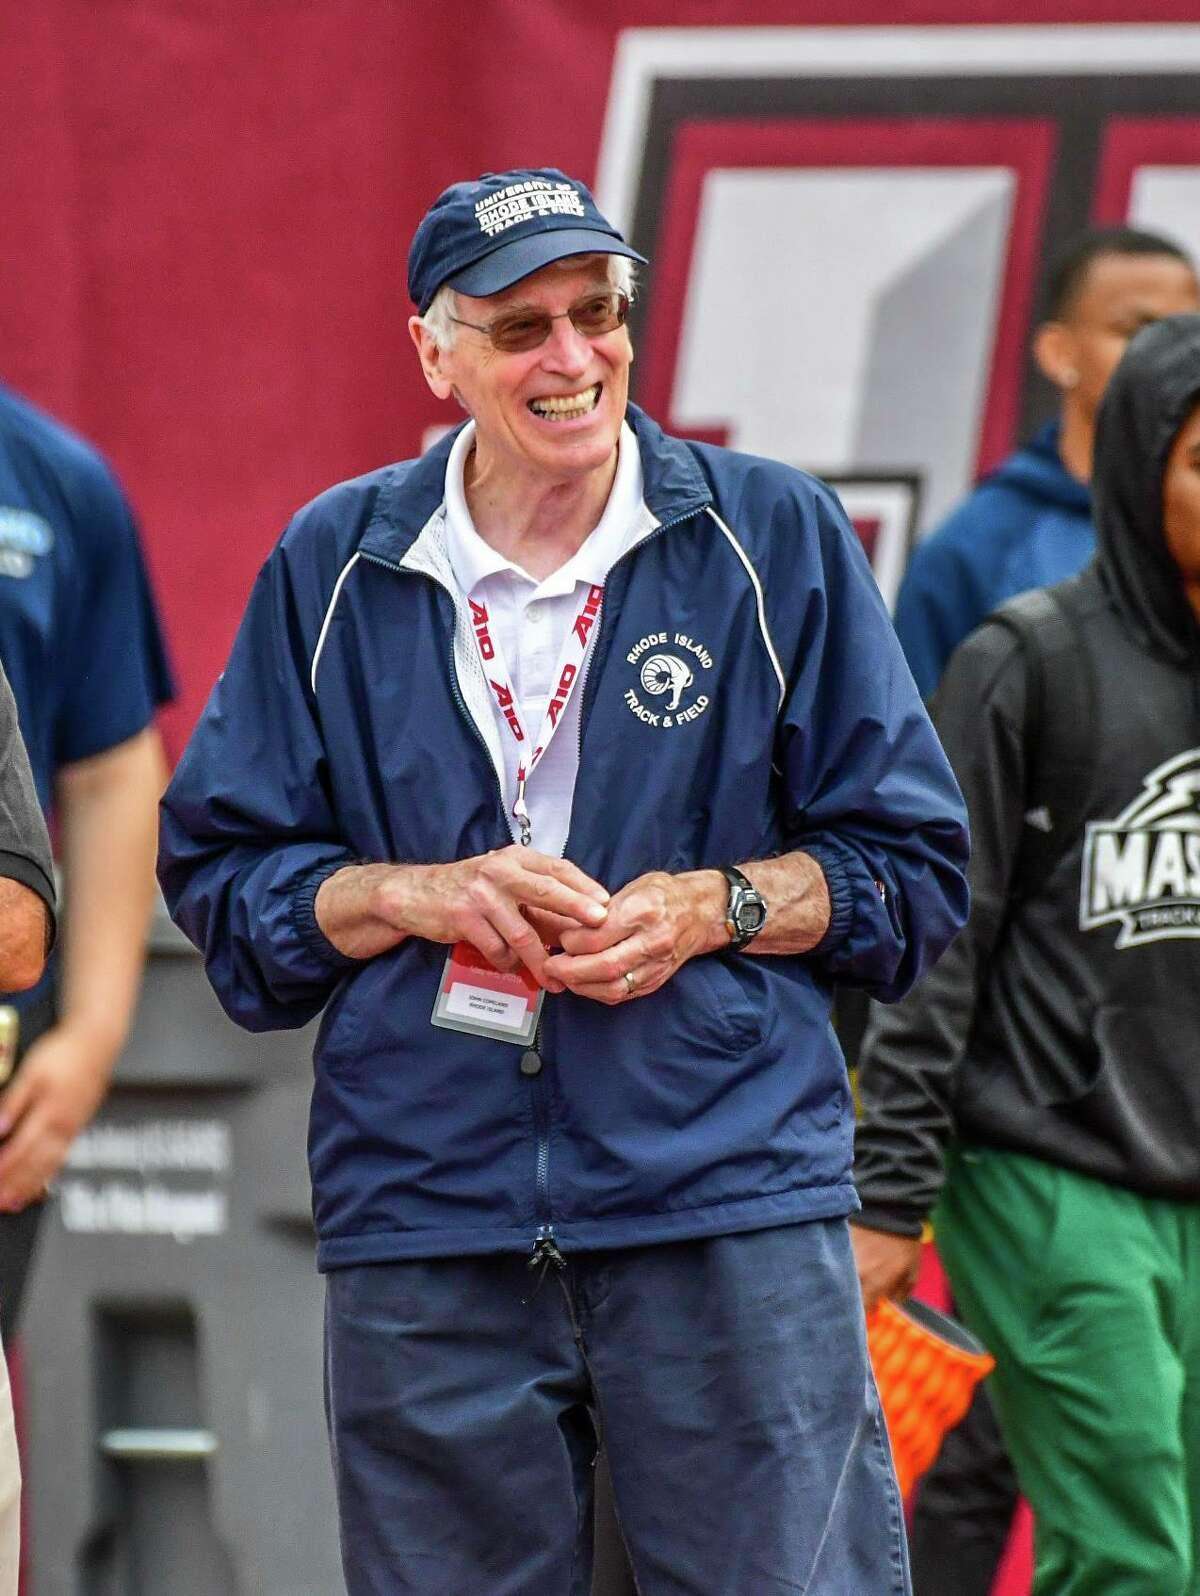 Rhode Island track and field coach John Copeland.